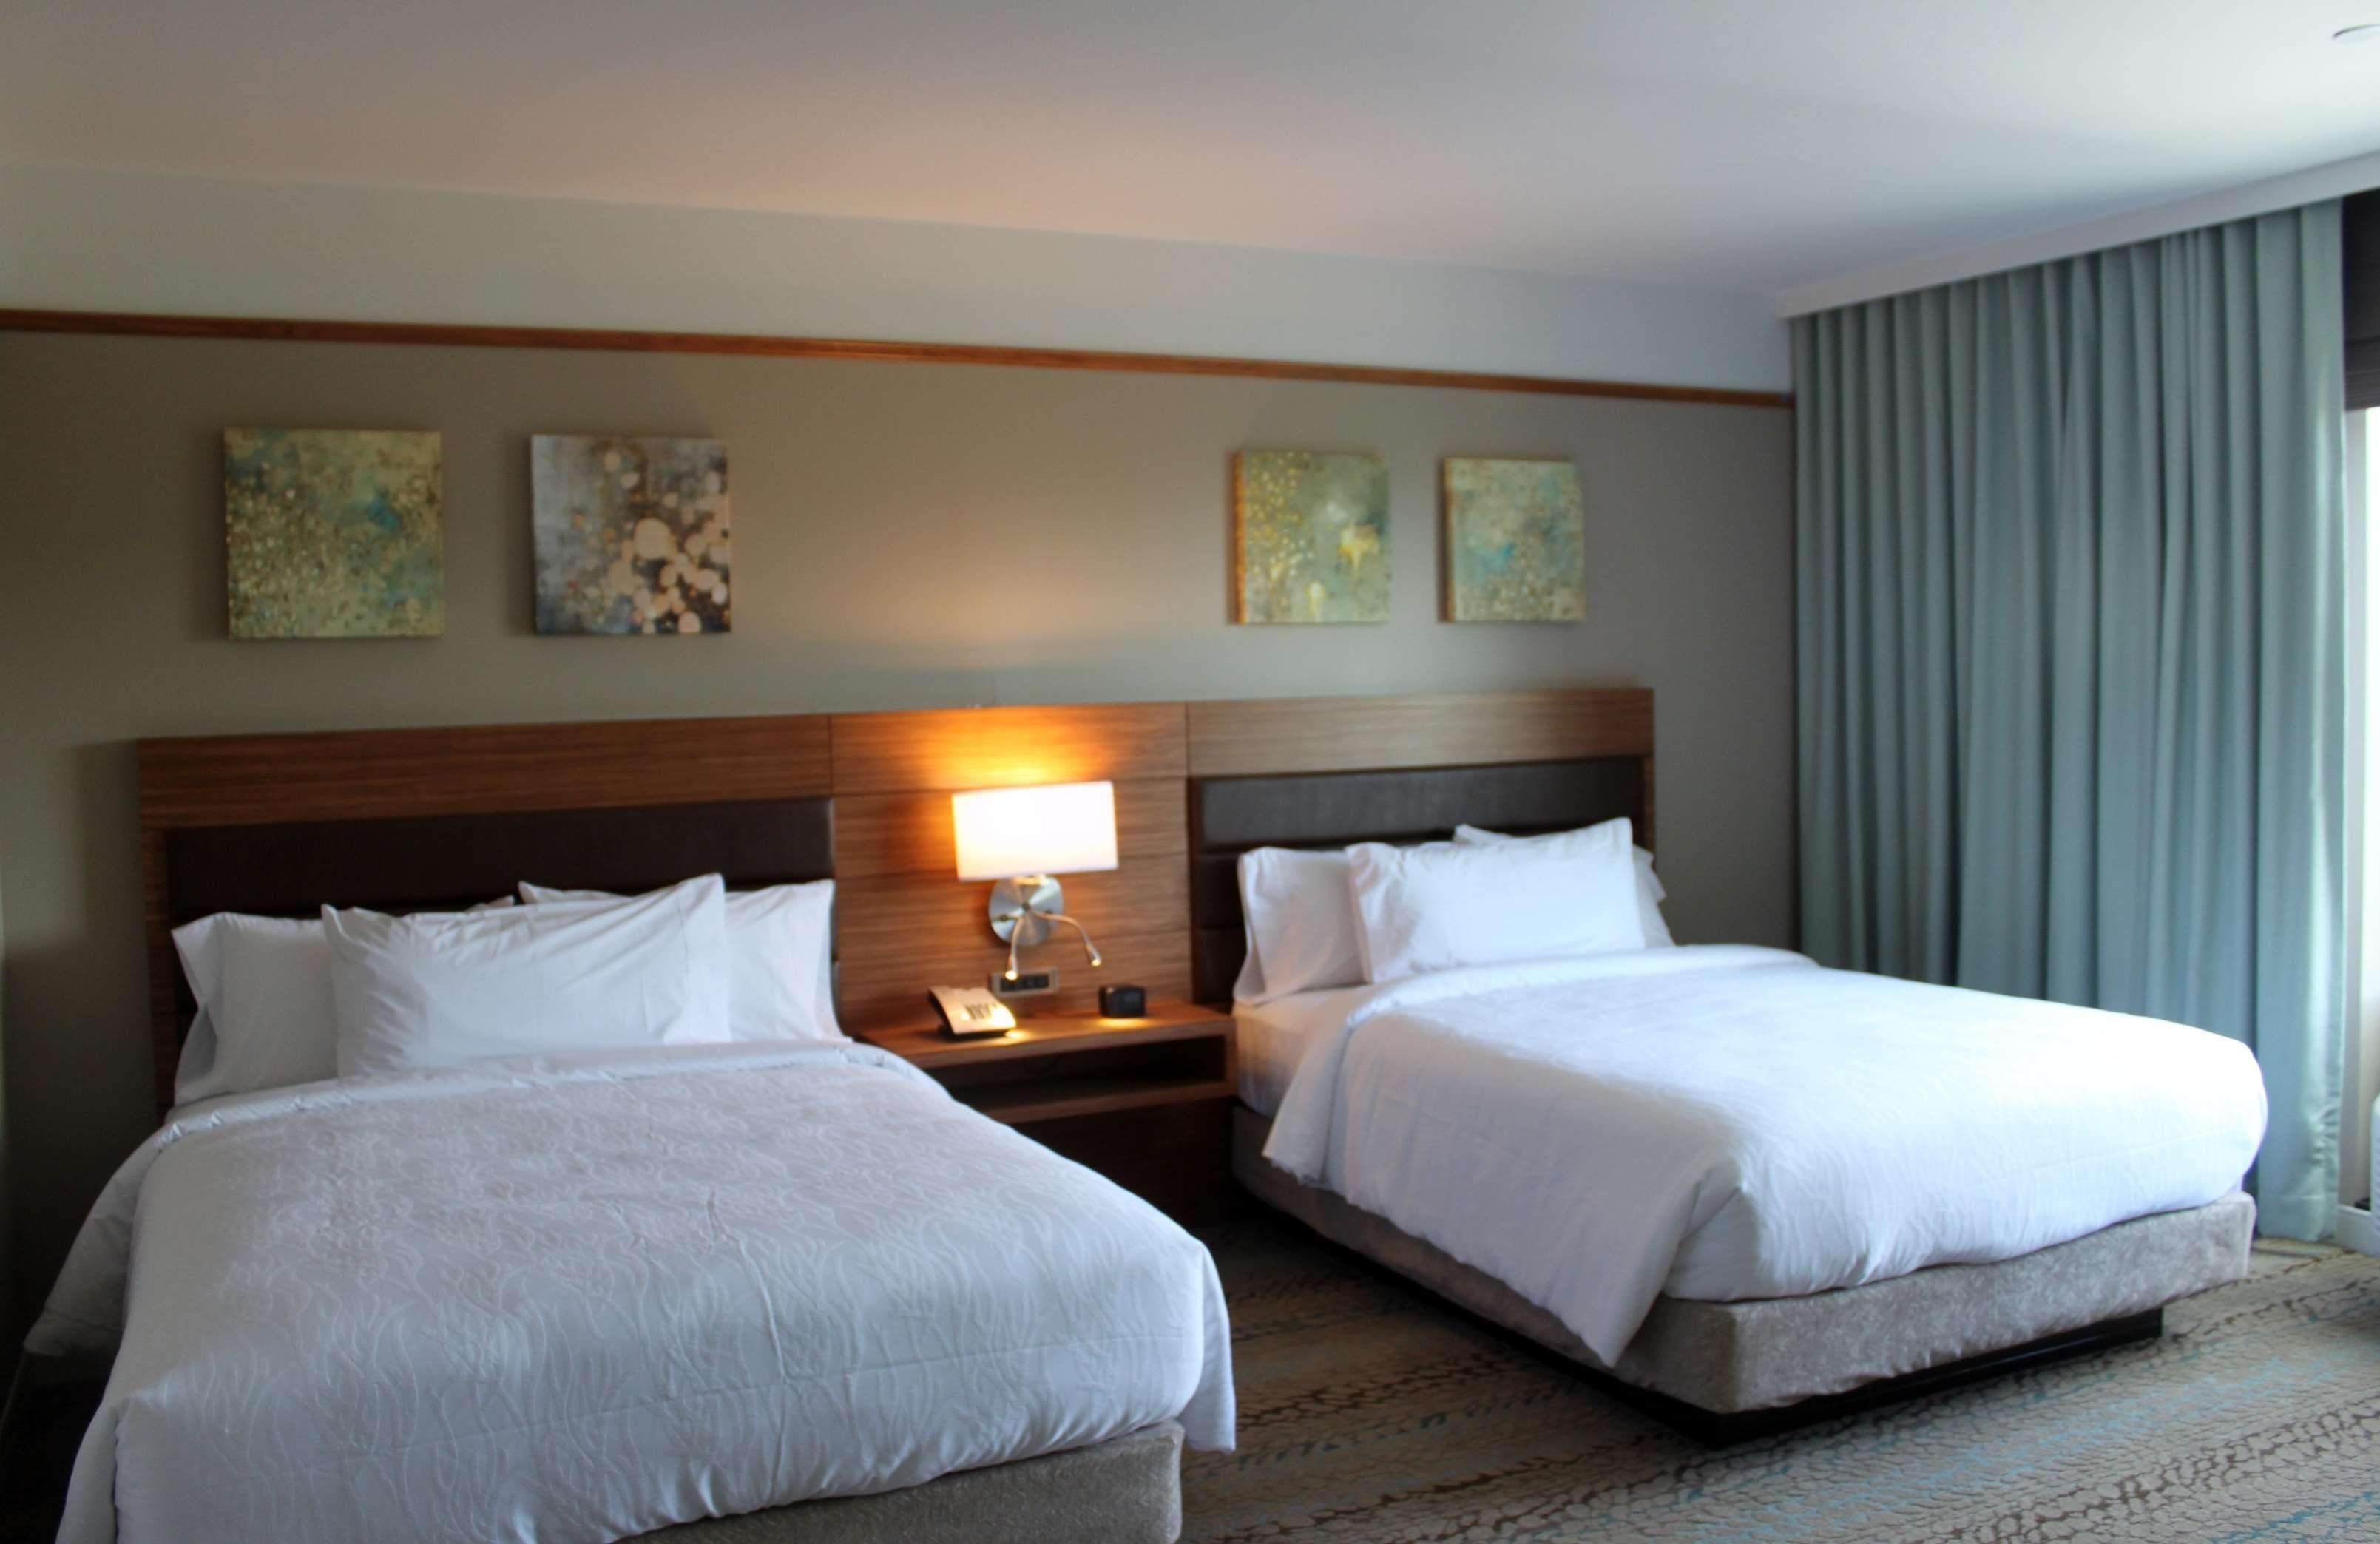 Hilton Garden Inn Boston/Marlborough image 18